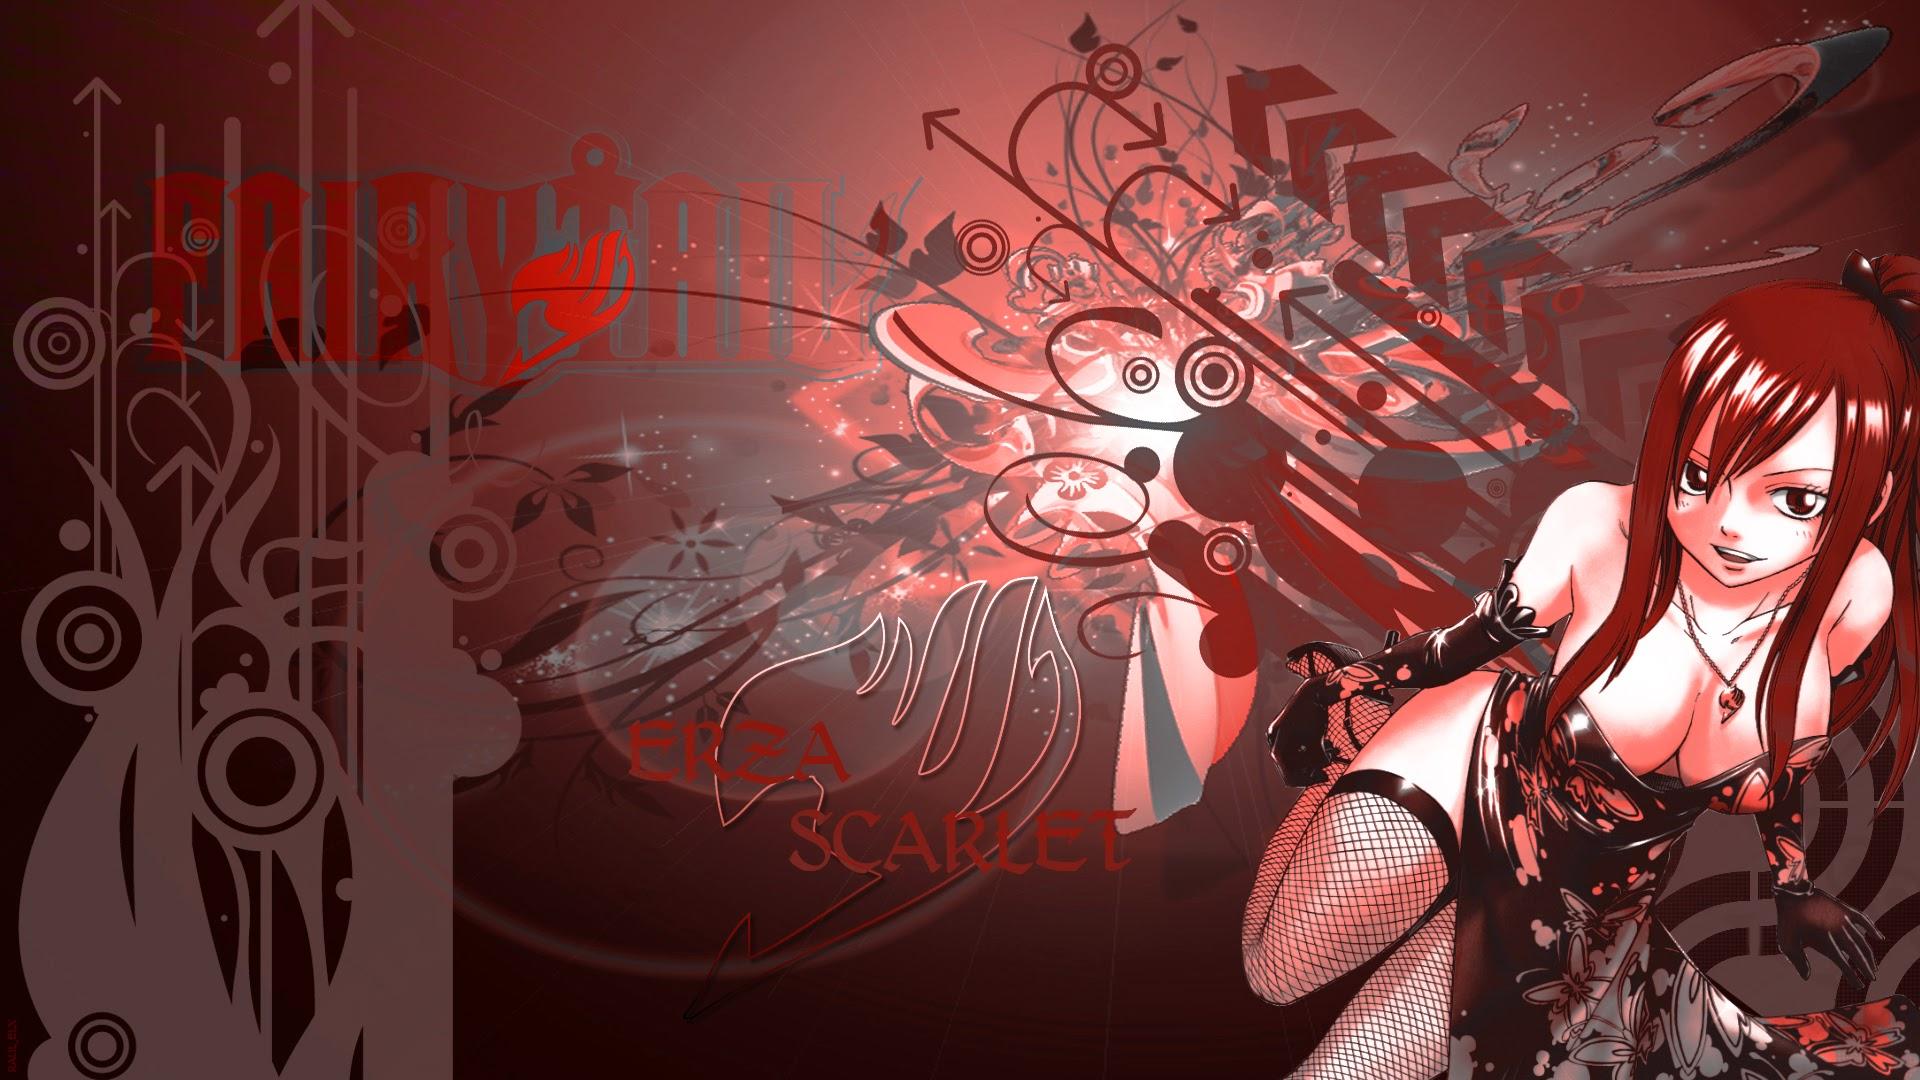 erza scarlet wallpaper hd wallpapersafari